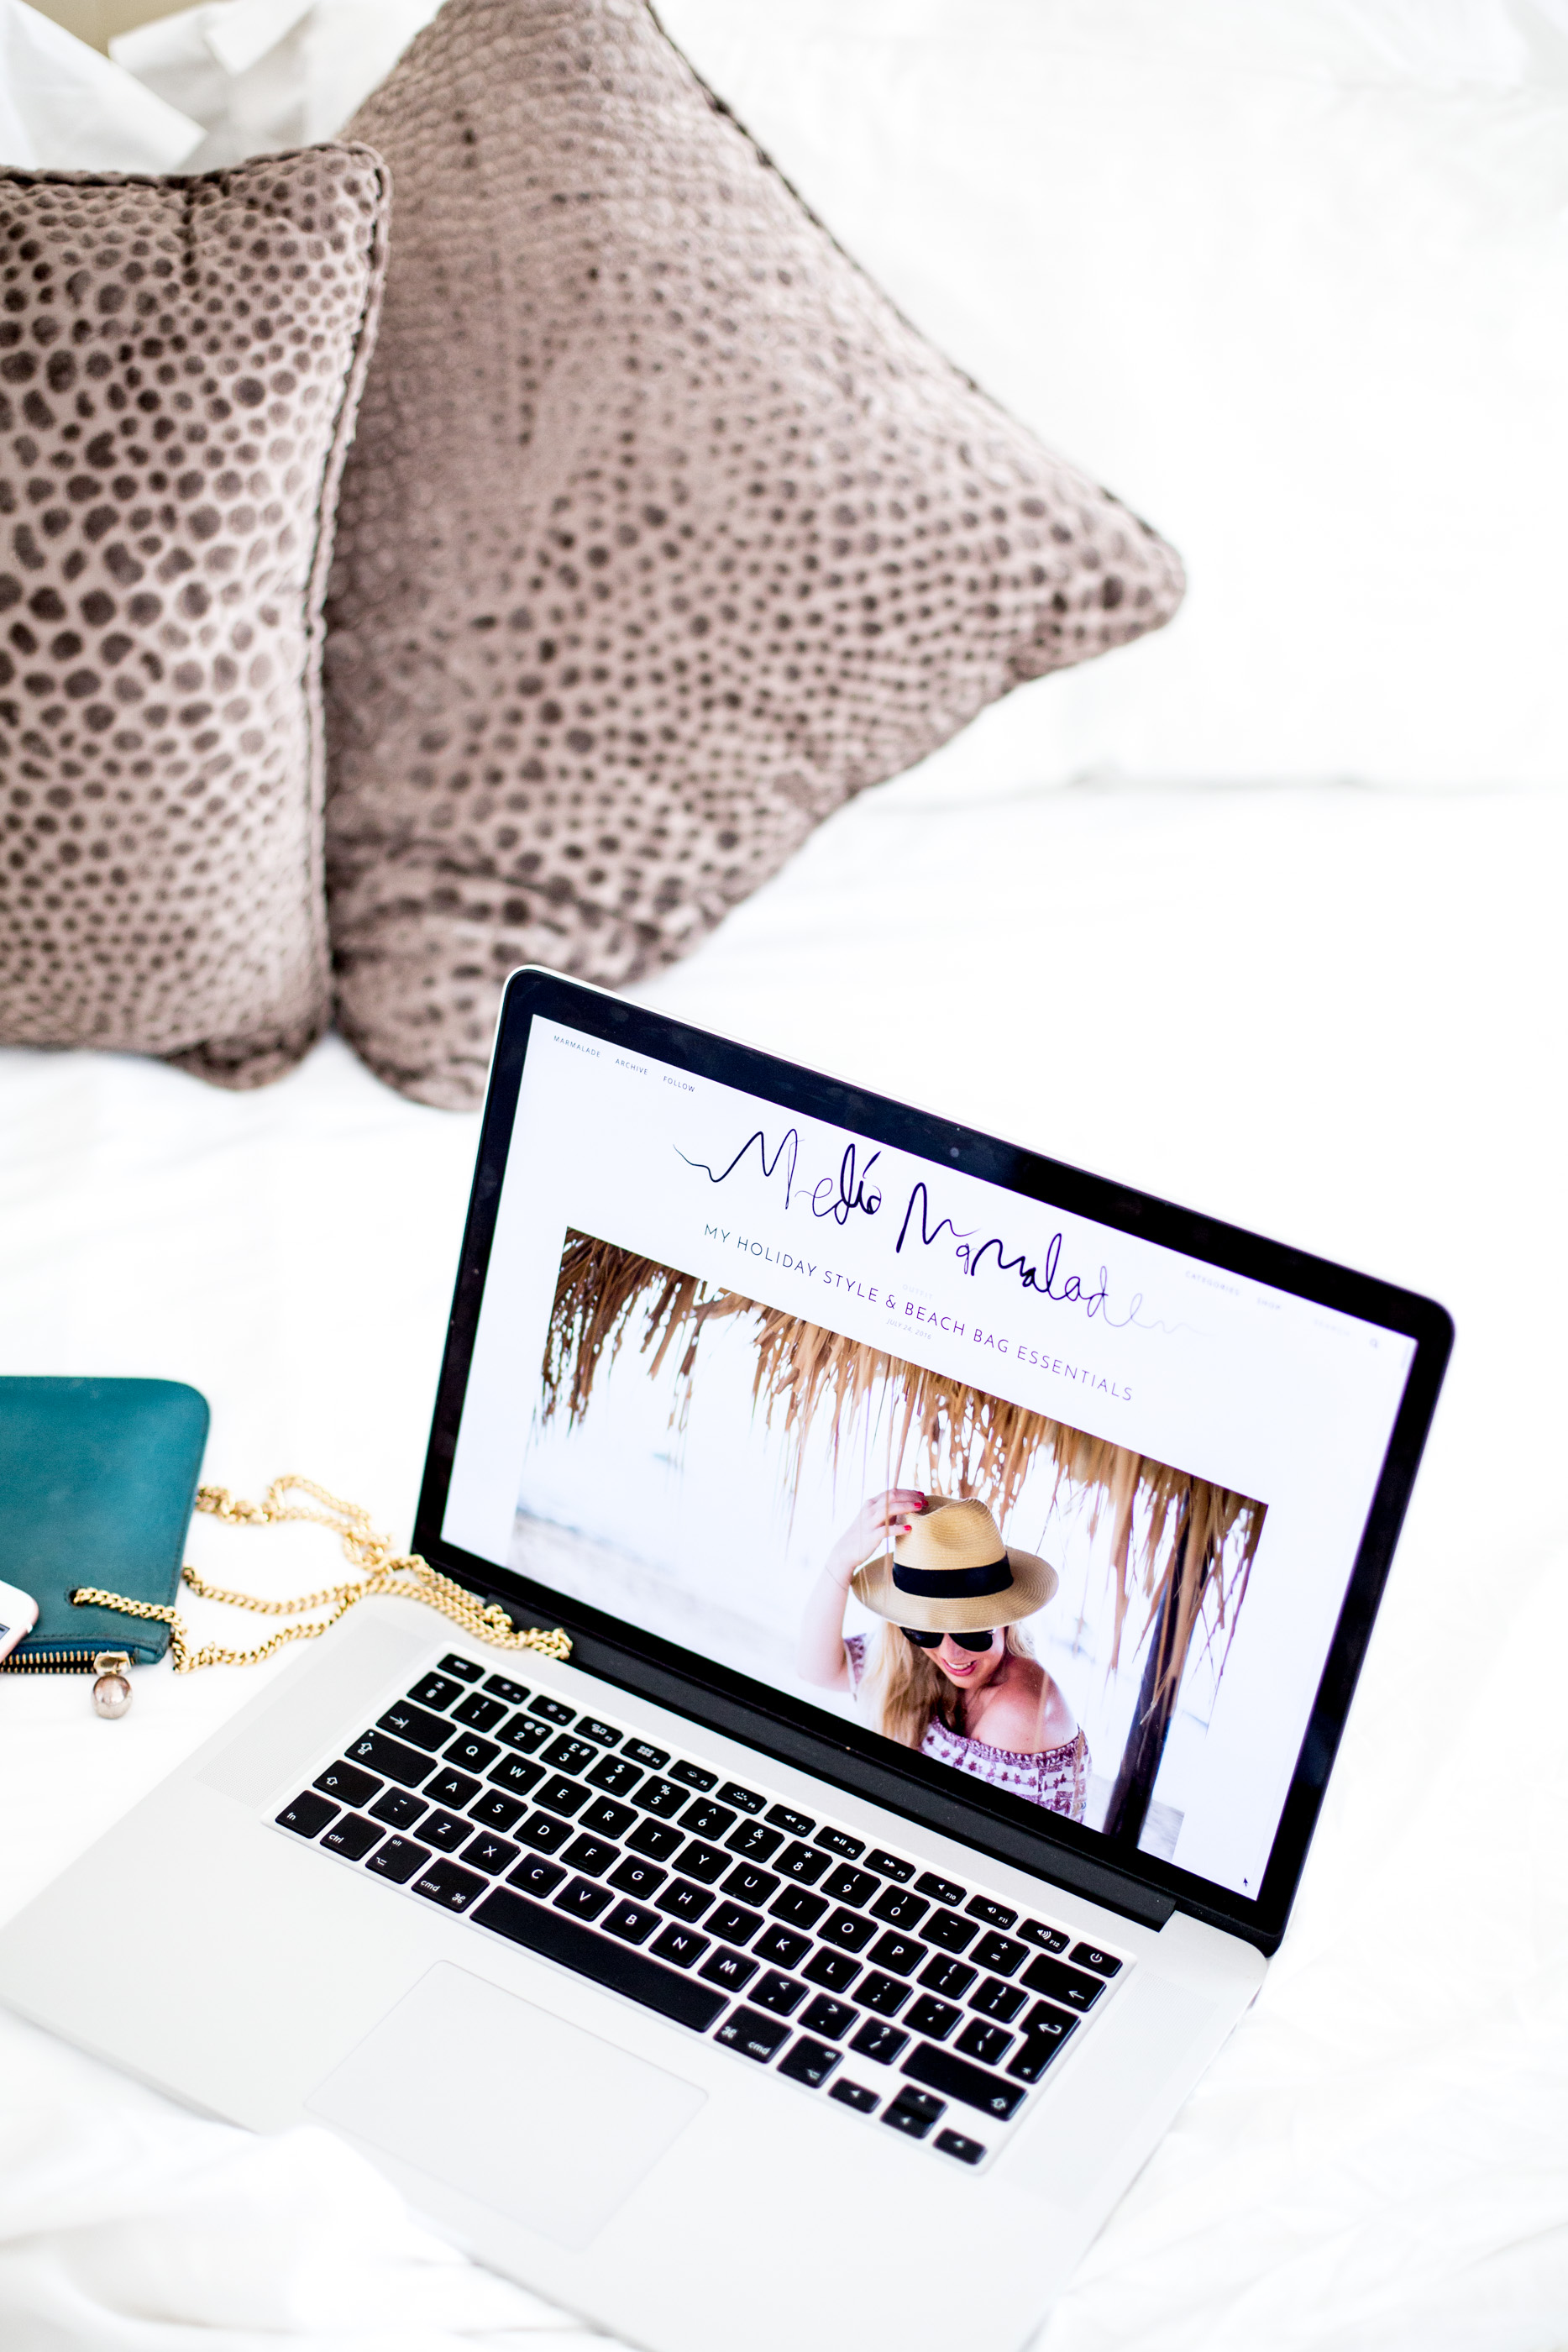 mediamarmalade travel blogging